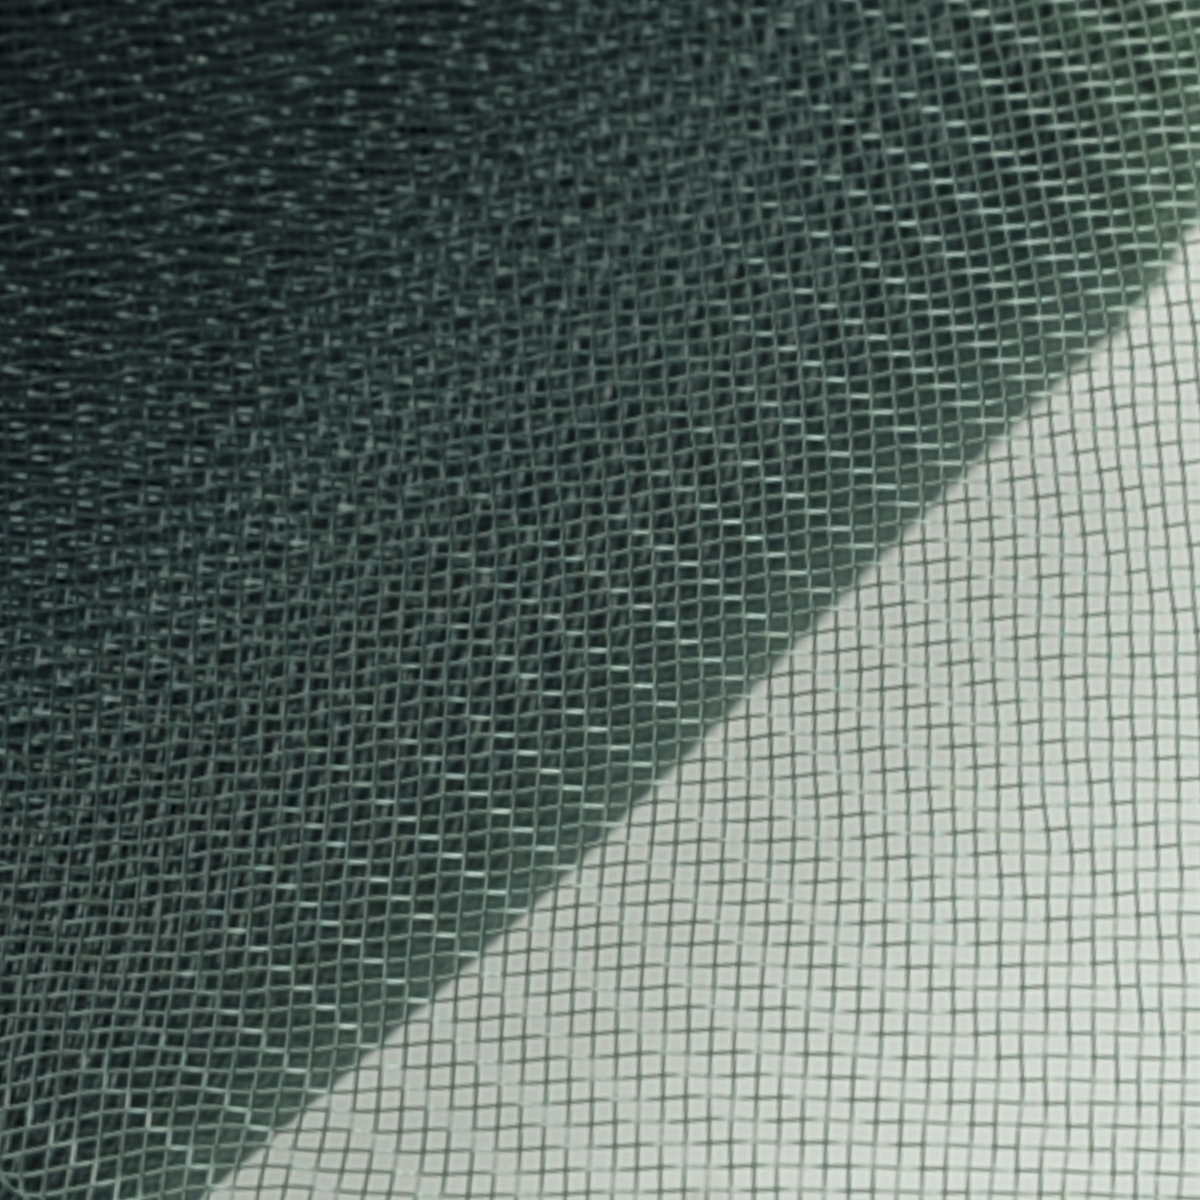 6 Inch Emerald Crinoline Chenille Dots Horsehair Braid